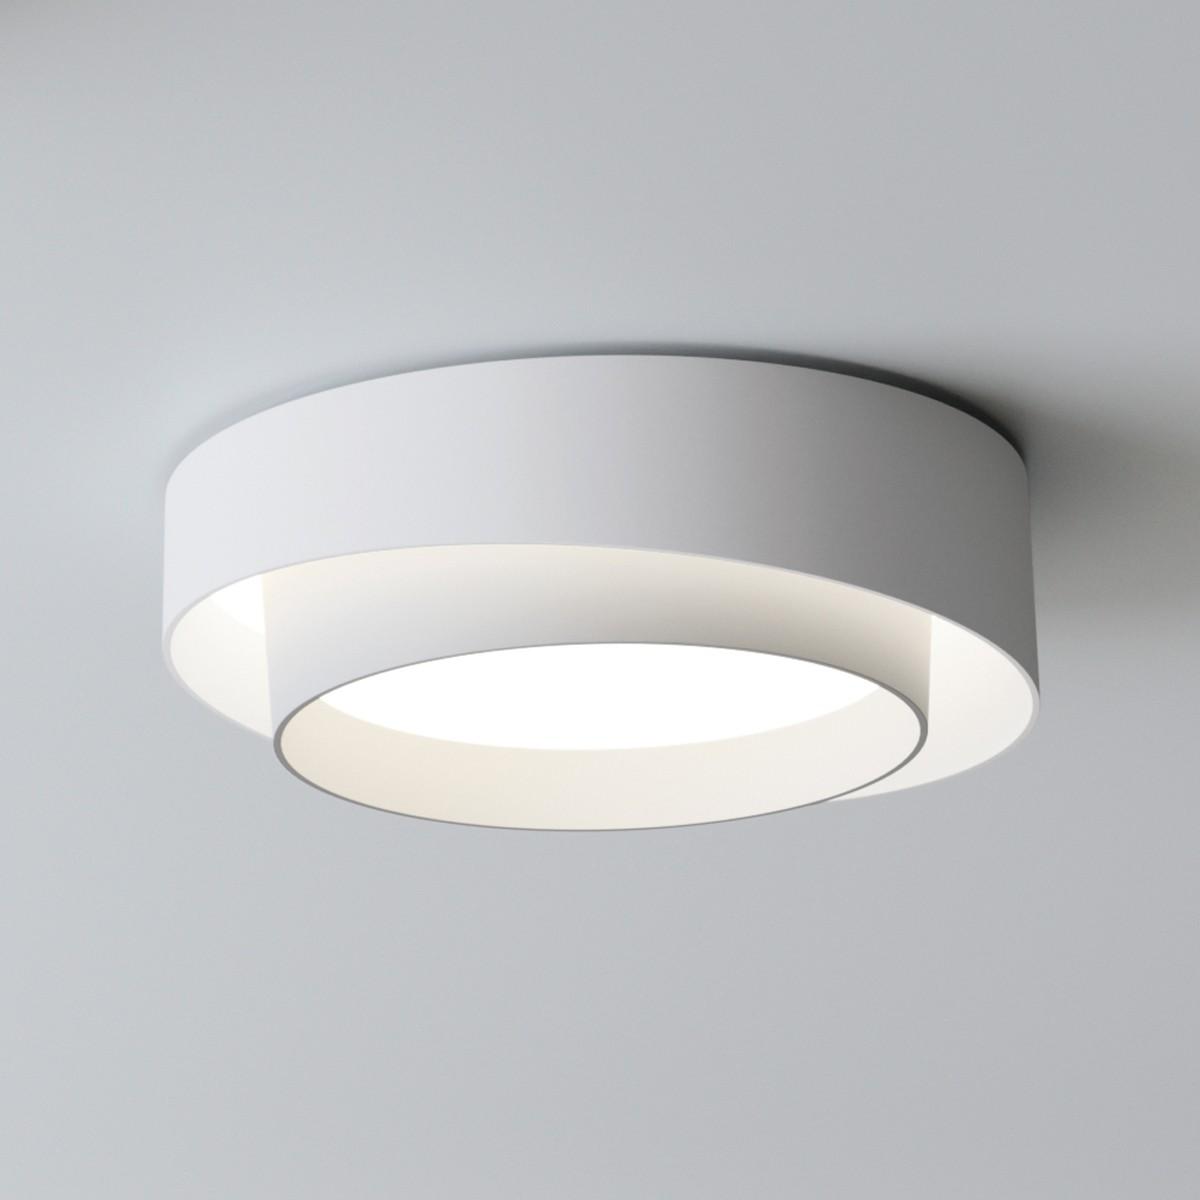 Vibia Centric 5700 Wand- / Deckenleuchte, weiß matt